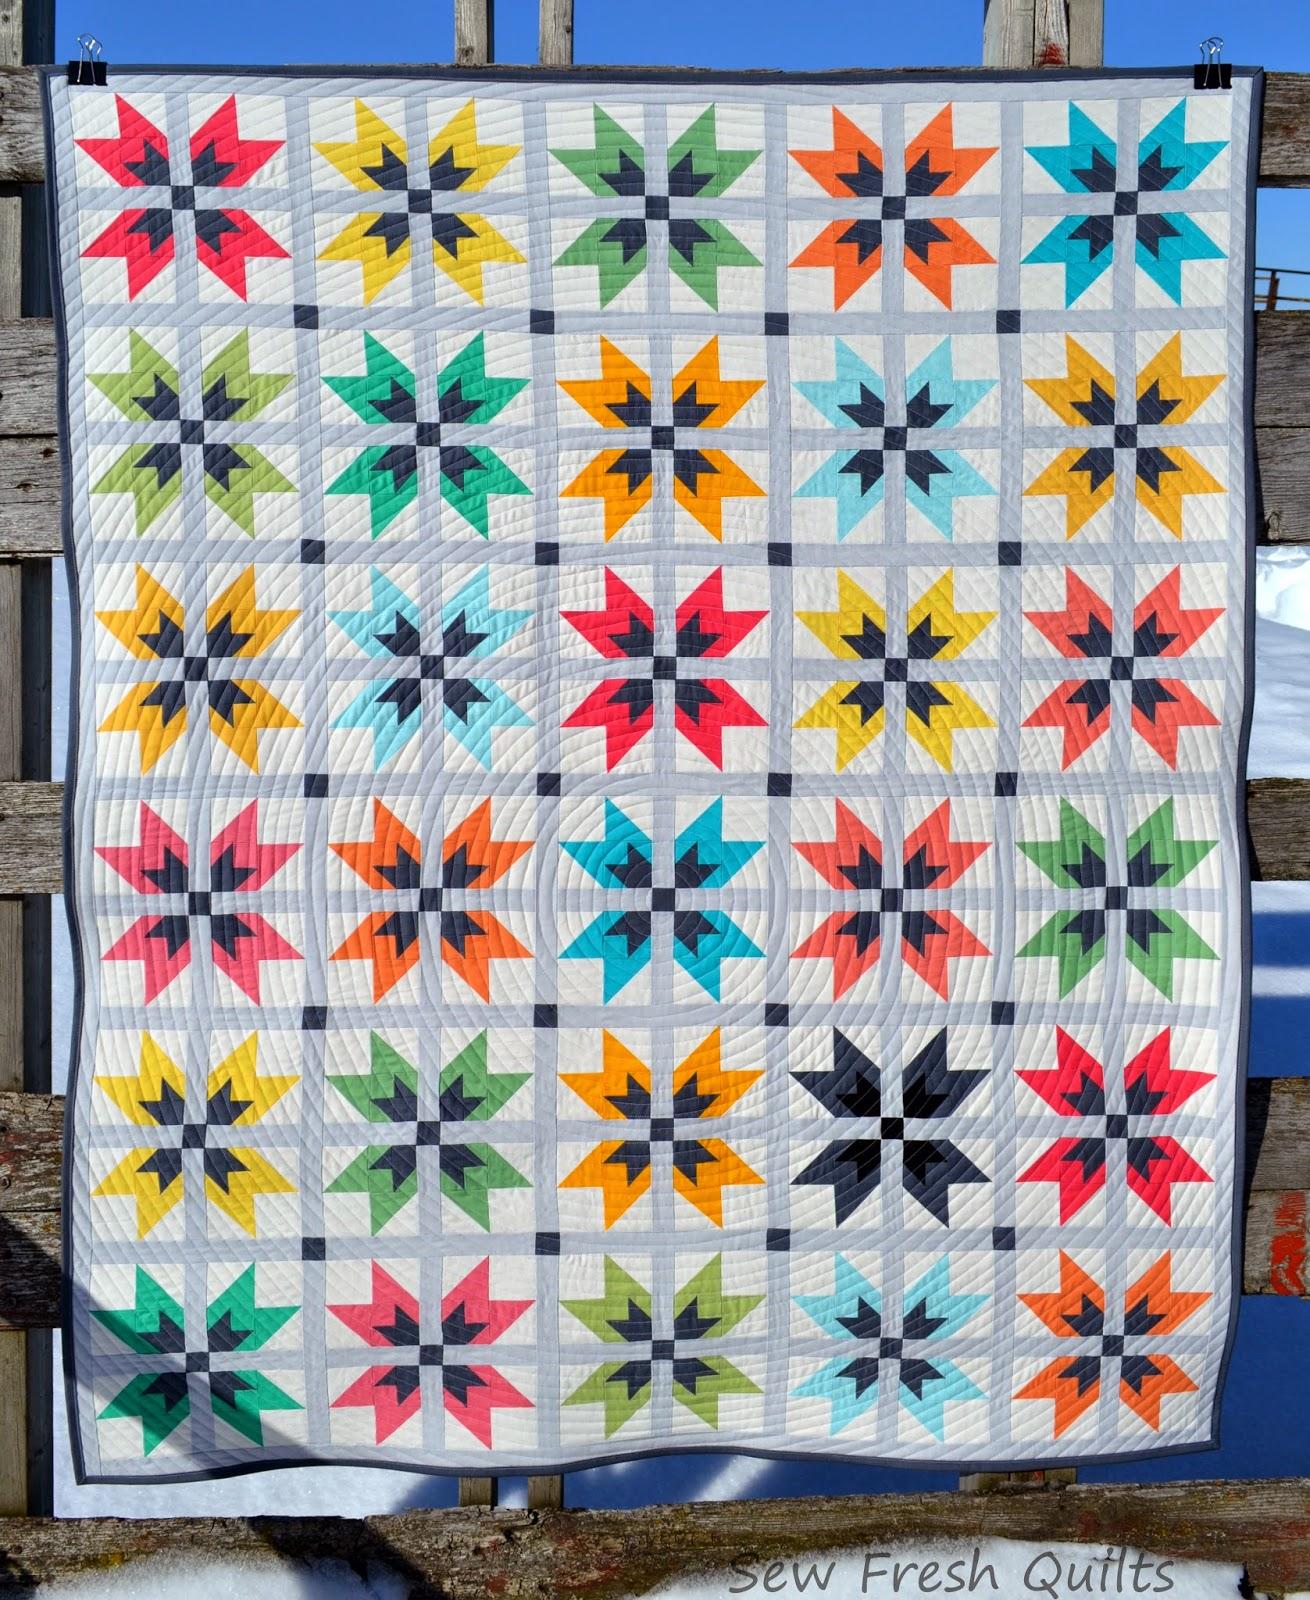 Sew Fresh Quilts: WoW-E! {a custom quilt} : custom photo quilts - Adamdwight.com